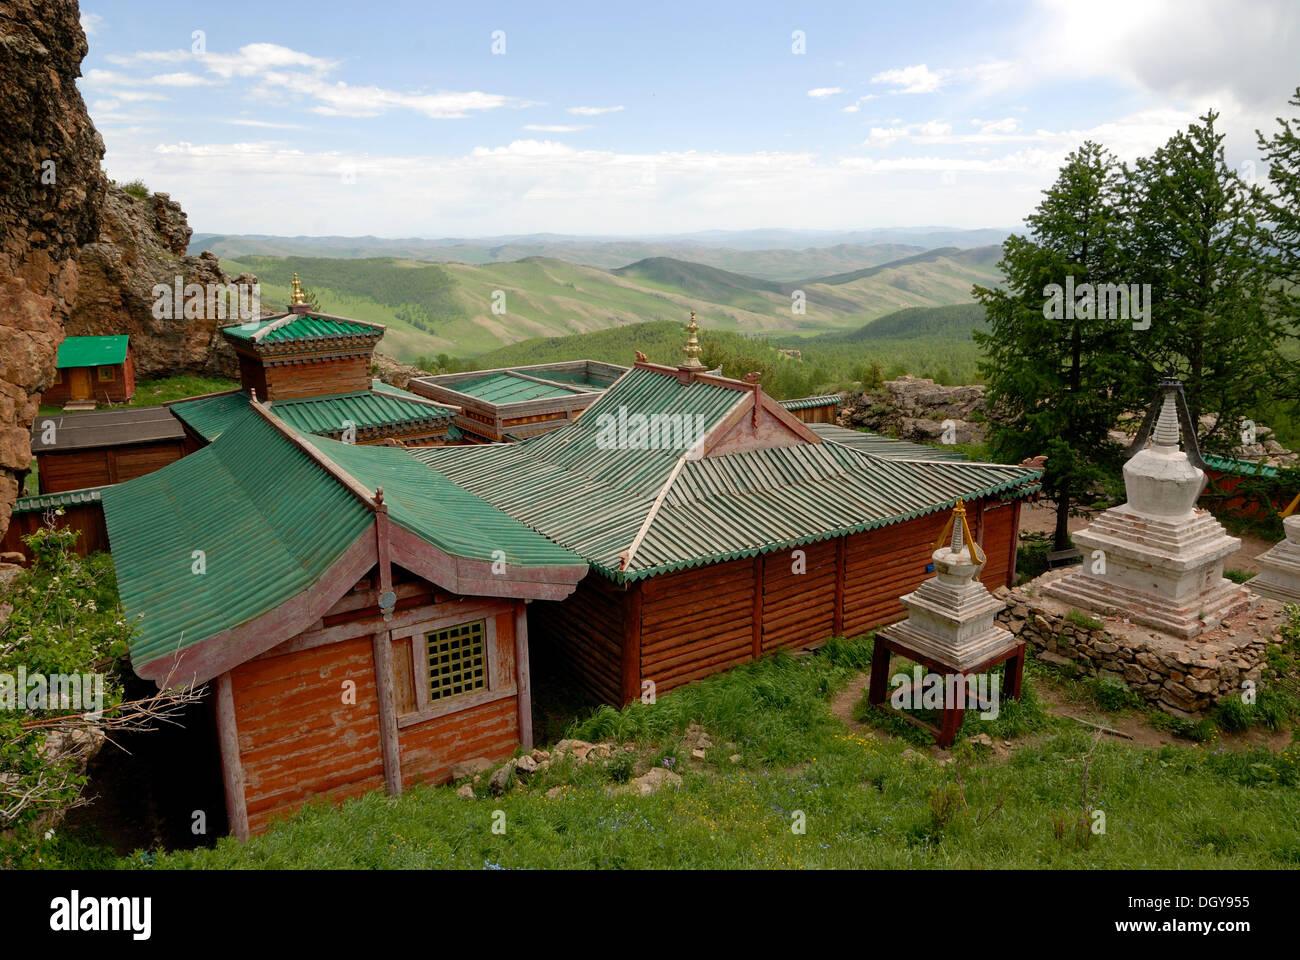 Buddhist monastery with chortens in the mountains of Khangai Nuruu National Park, Toevkhoen Khiid, Orkhon Khuerkhree, Kharkhorin - Stock Image